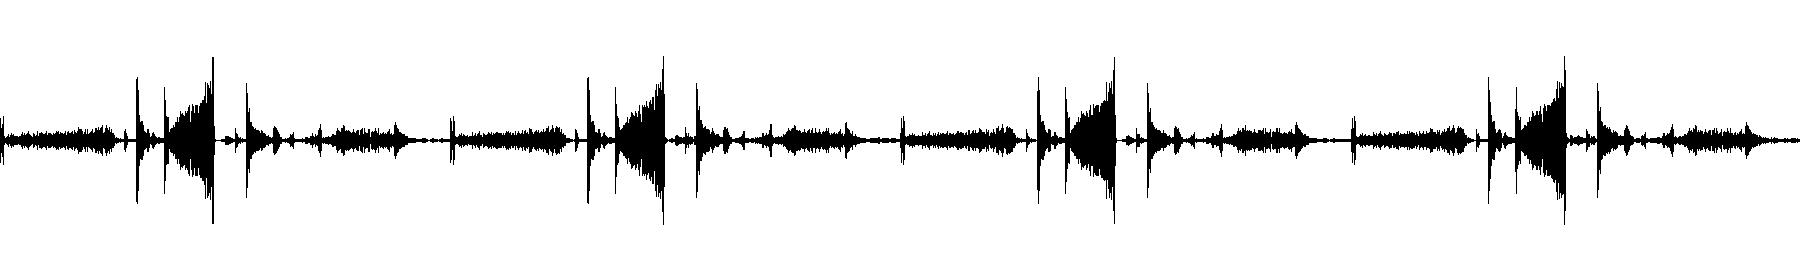 vk loopshift 01